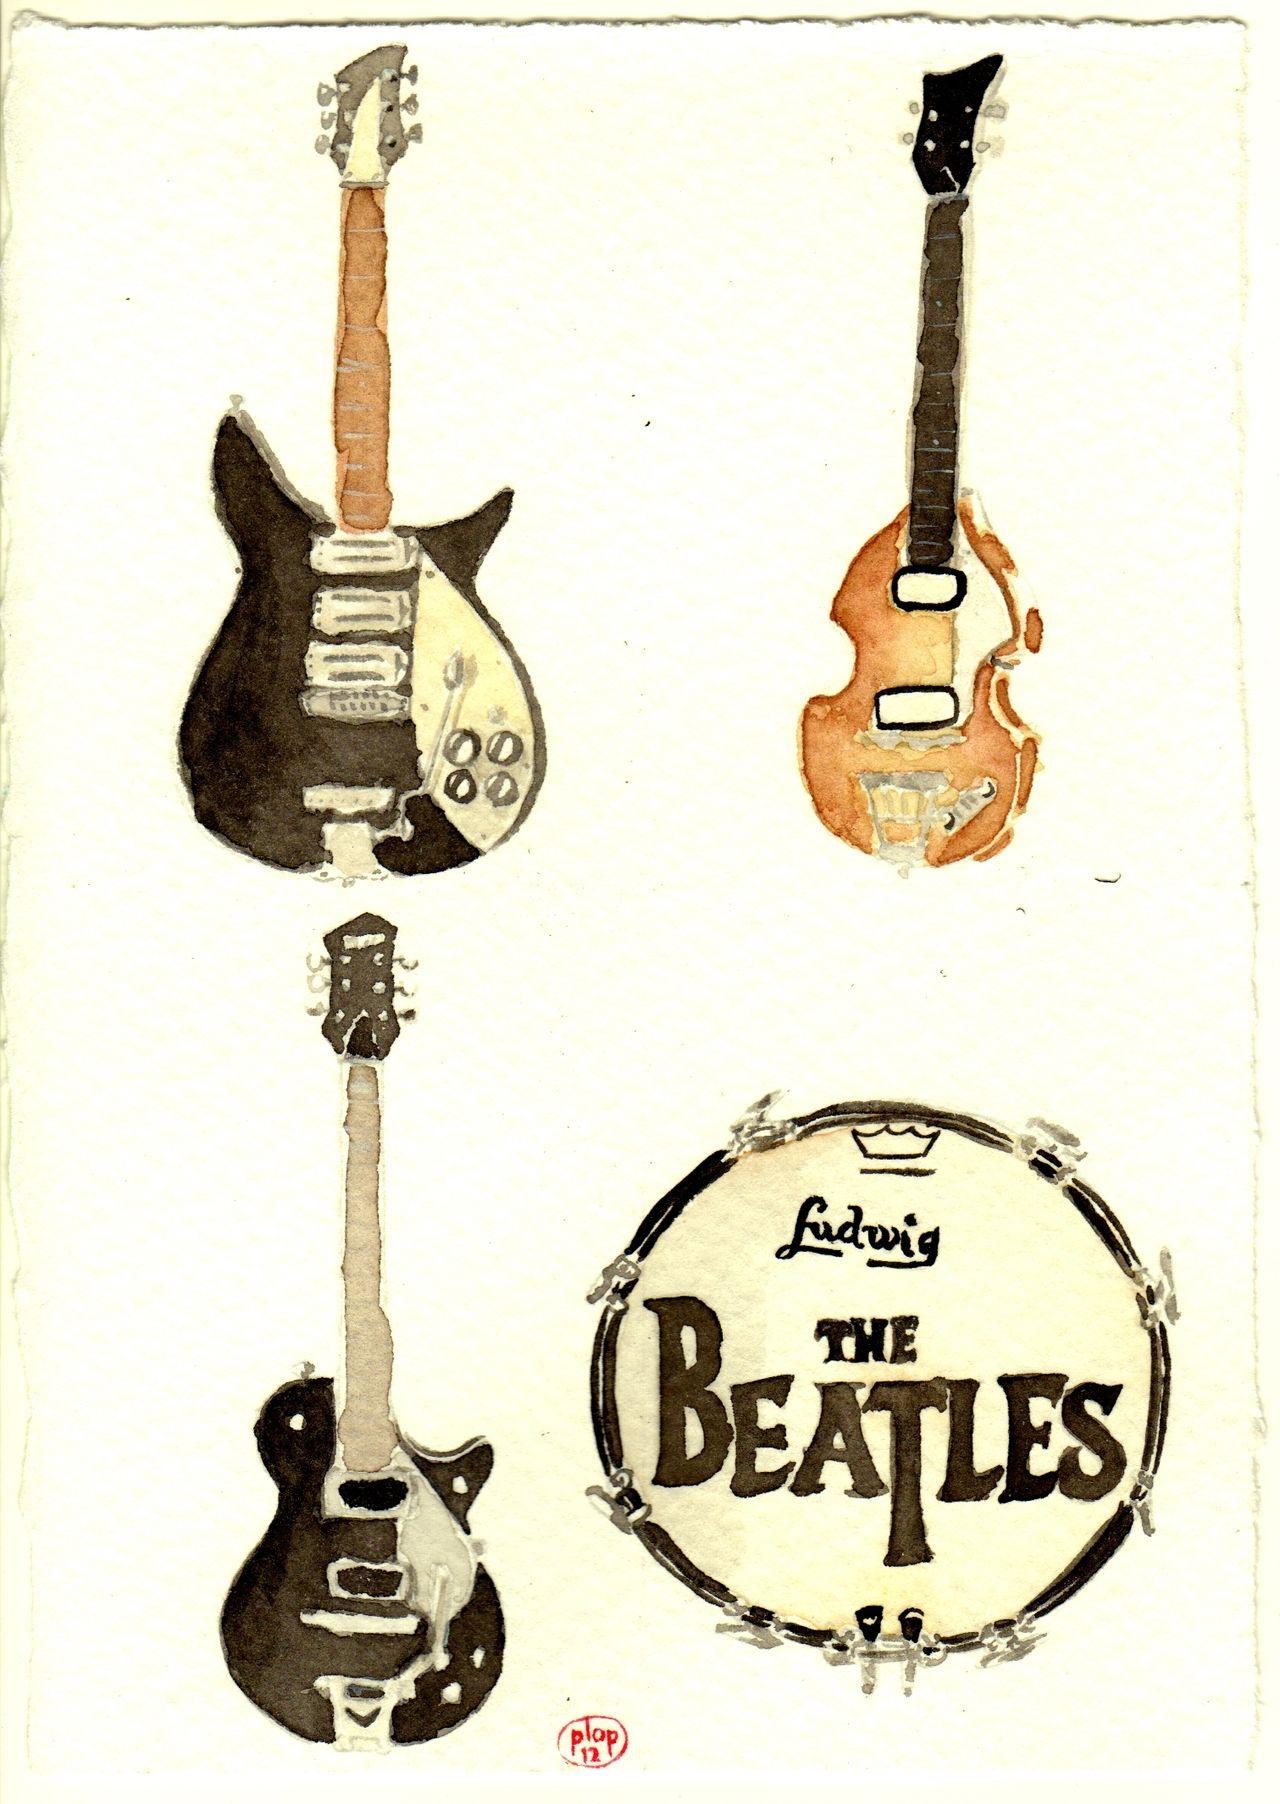 Beatles Guitars: Their Fab Four Instruments